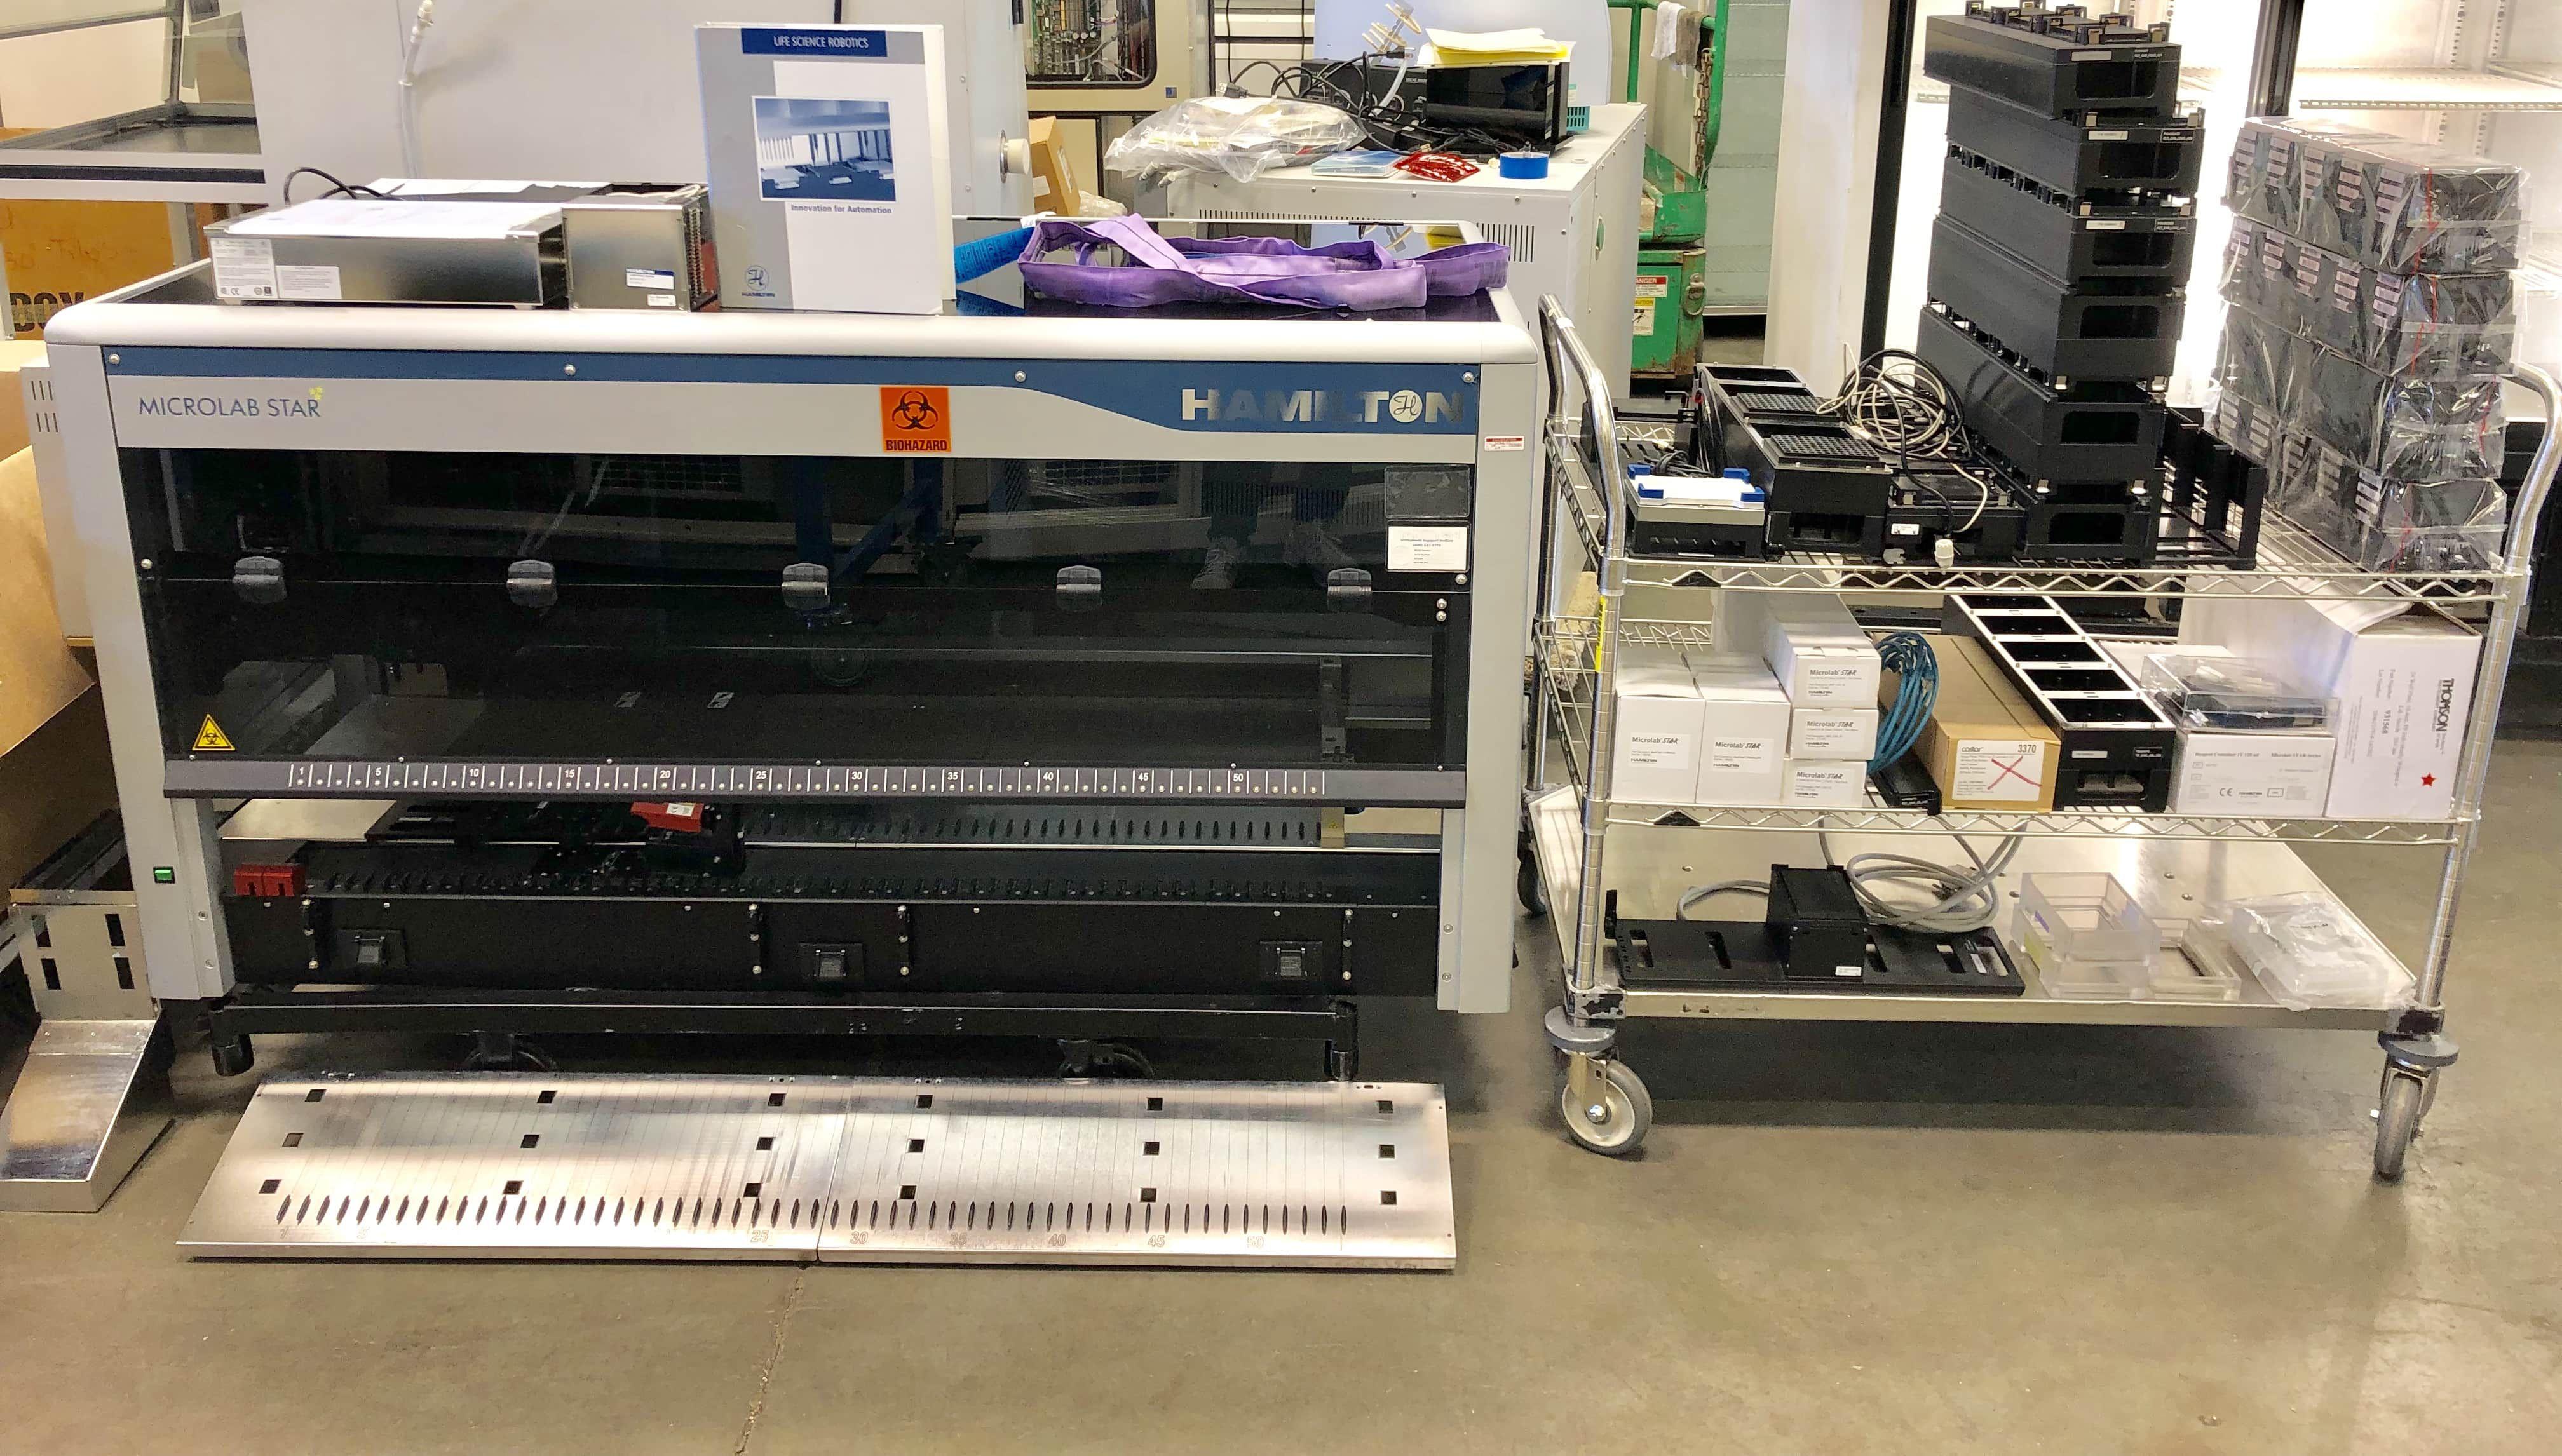 LOT Hamilton Microlab Star Liquid Handling System #173000